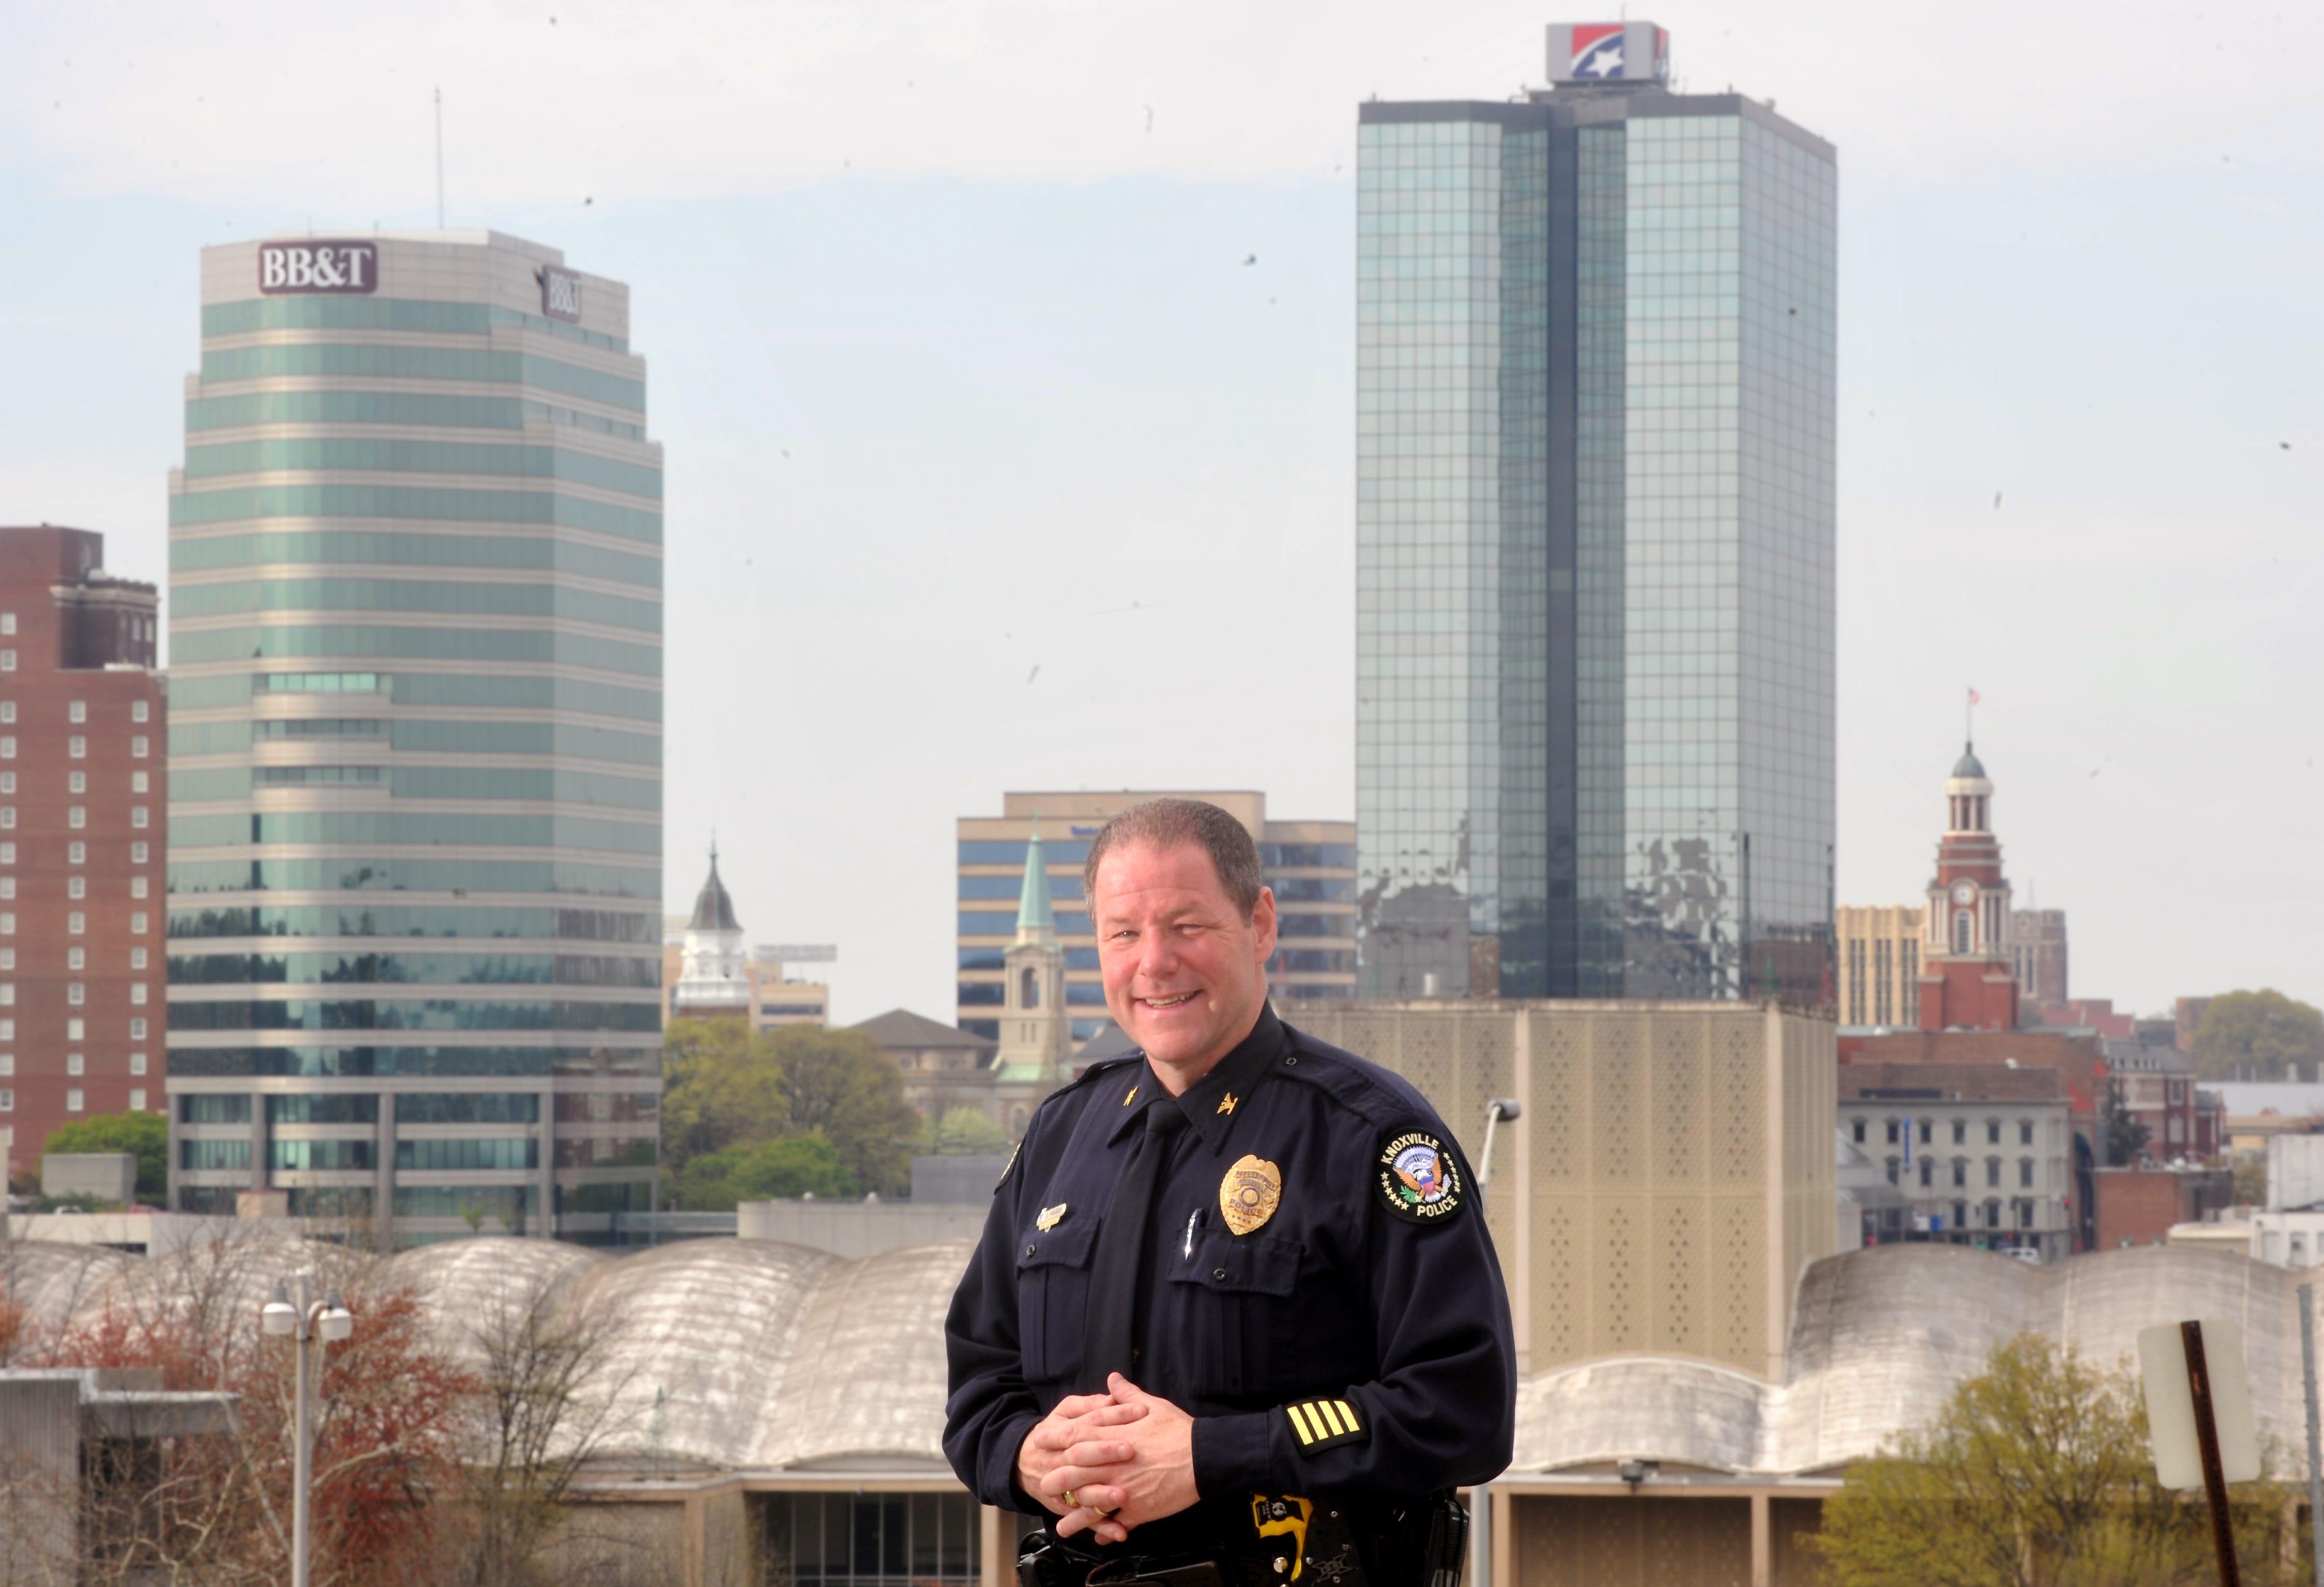 KPD plans to hide radio communications